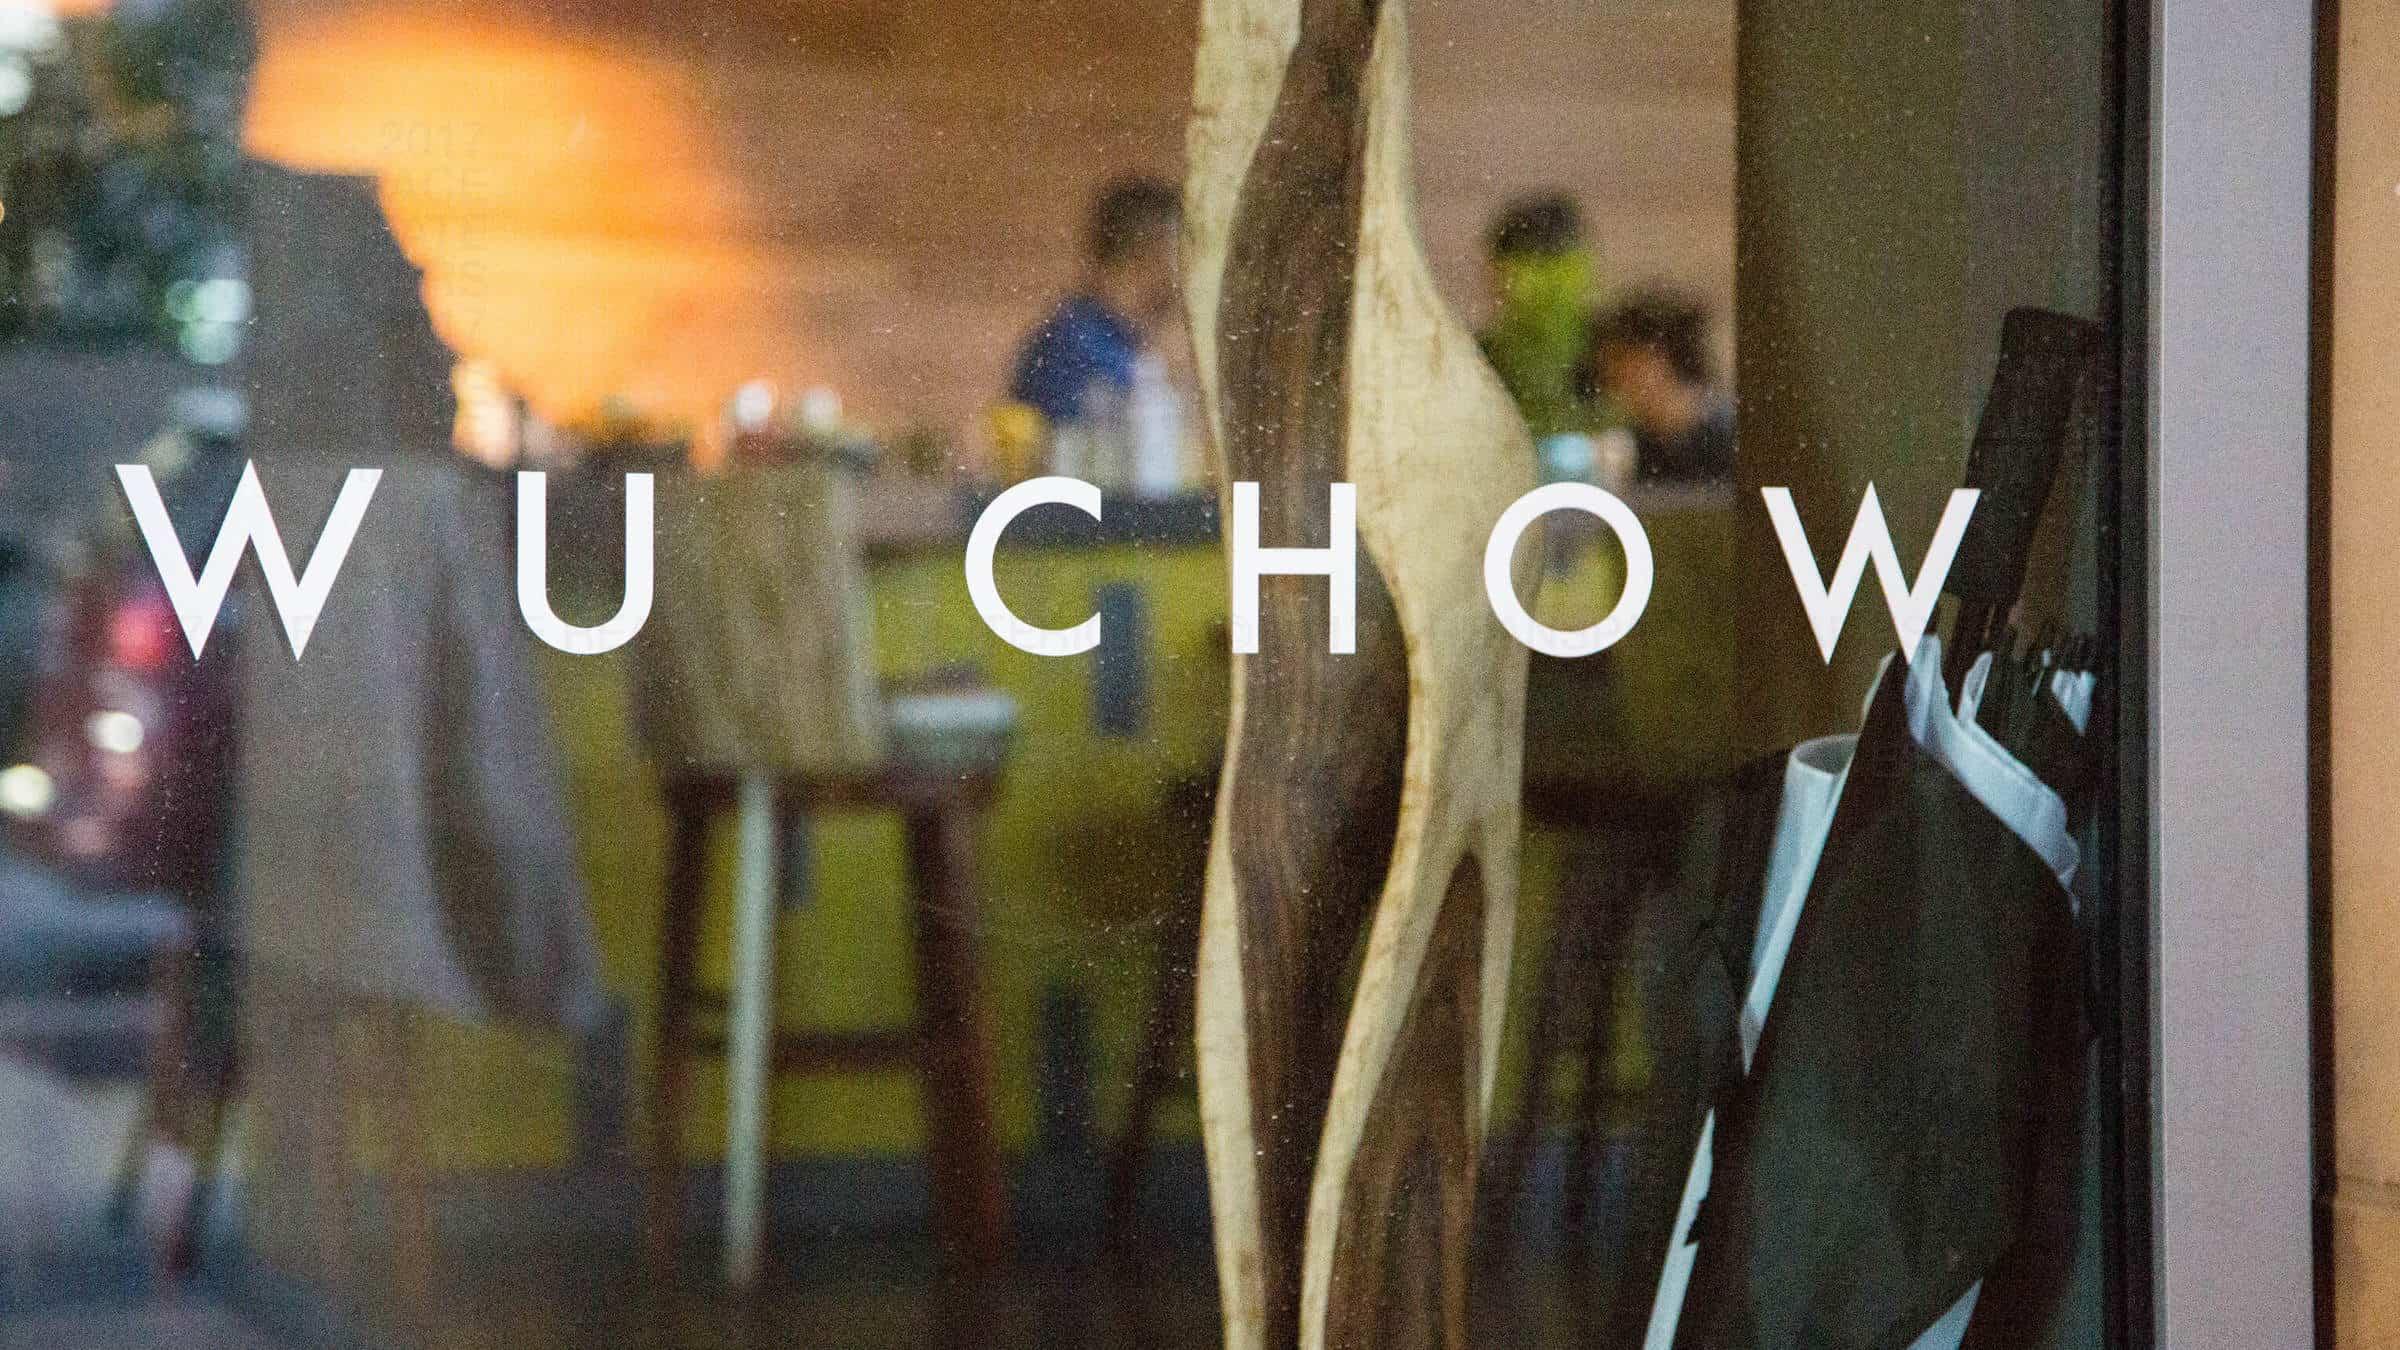 Market District - Wu Chow - Downtown Austin